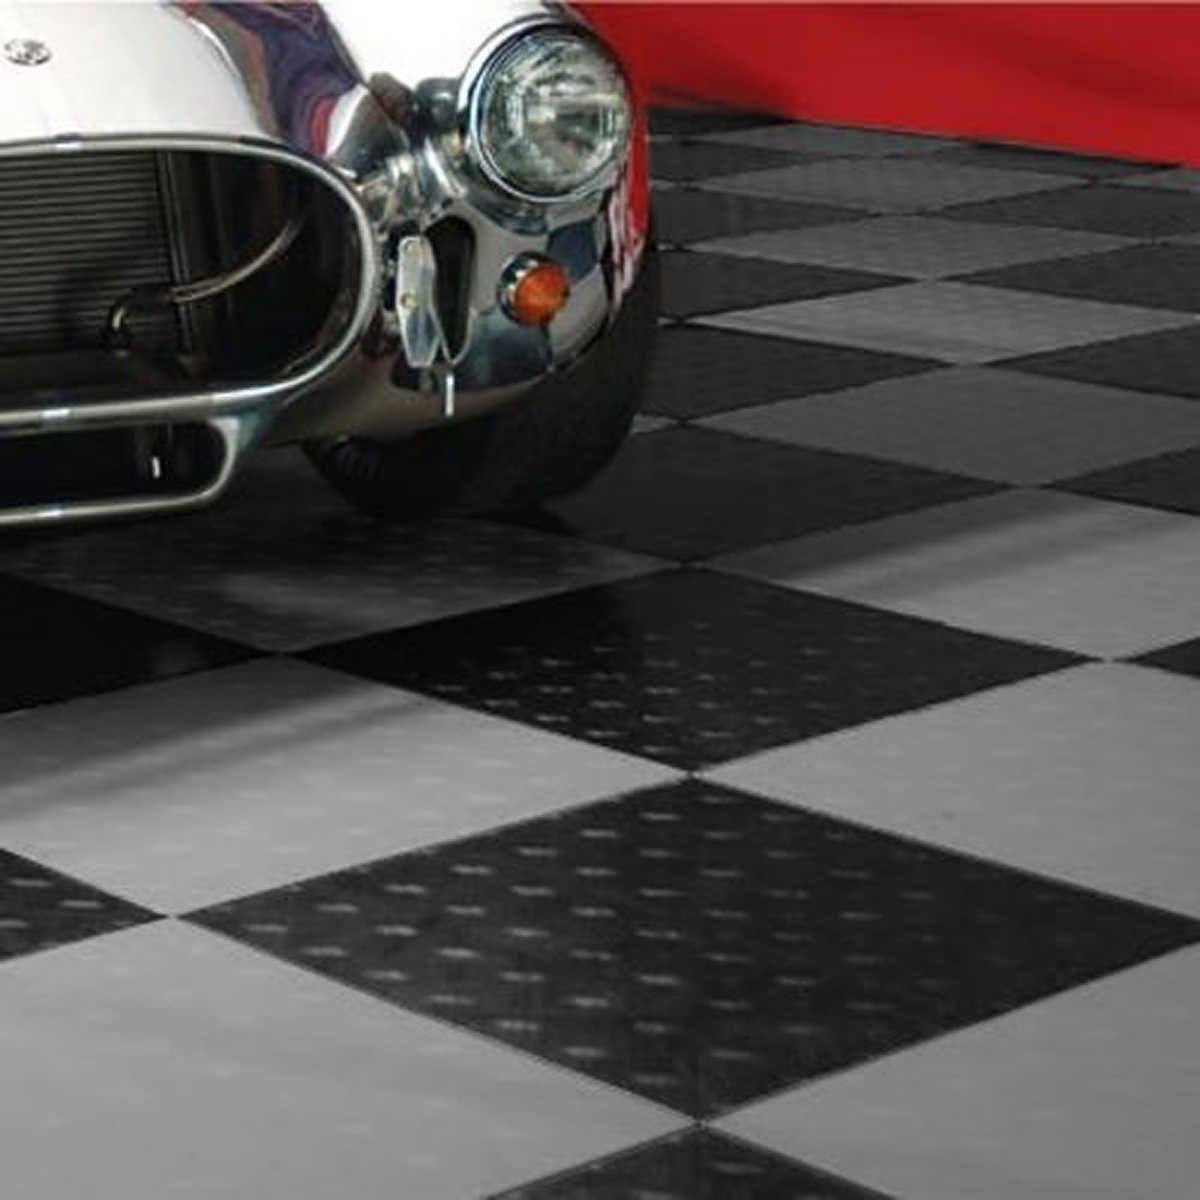 MotoFloor Modular Garage Flooring Tiles 48 square feet per